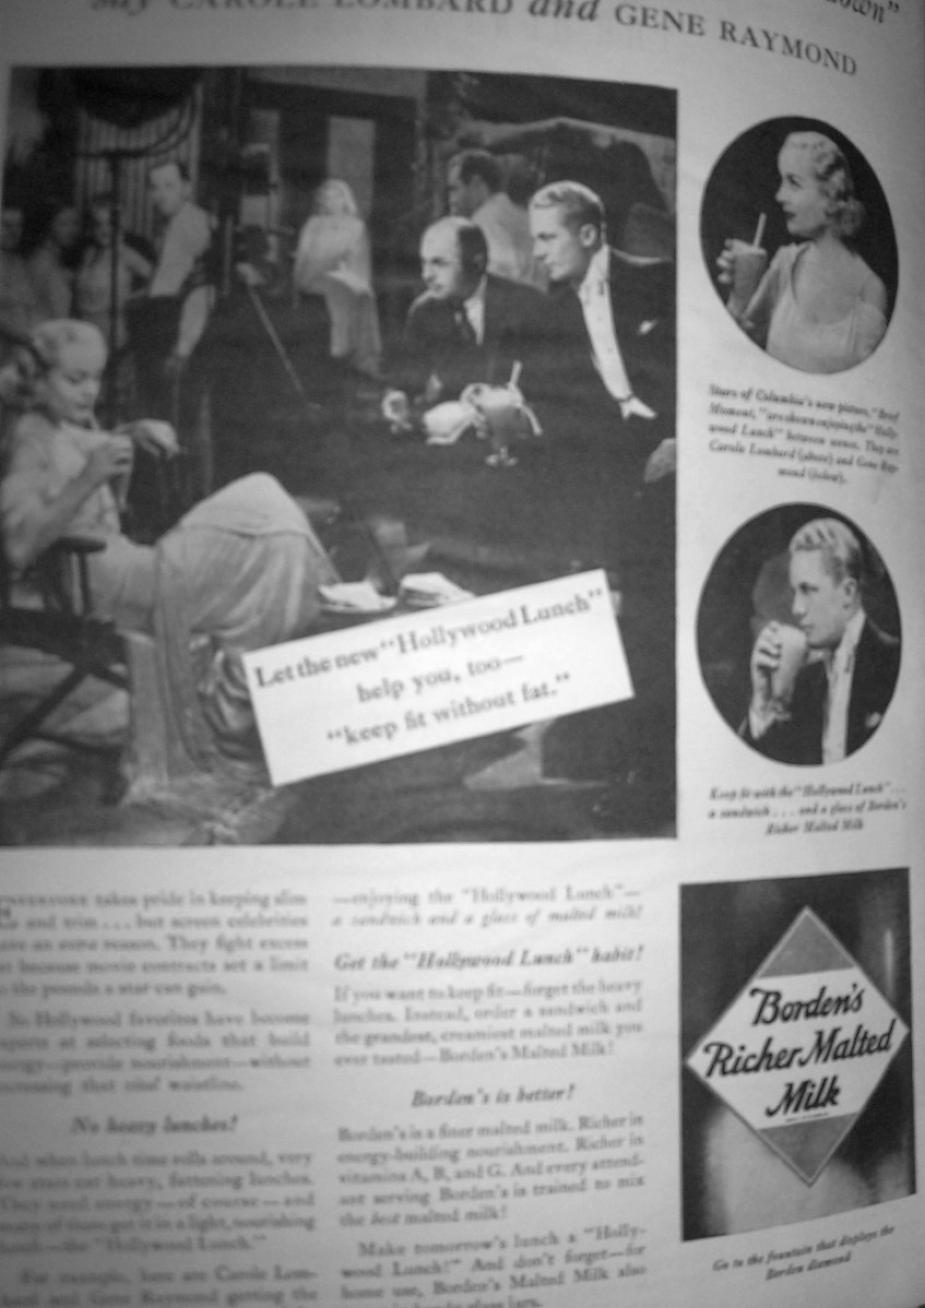 carole lombard shadoplay sept 1933 borden ad large